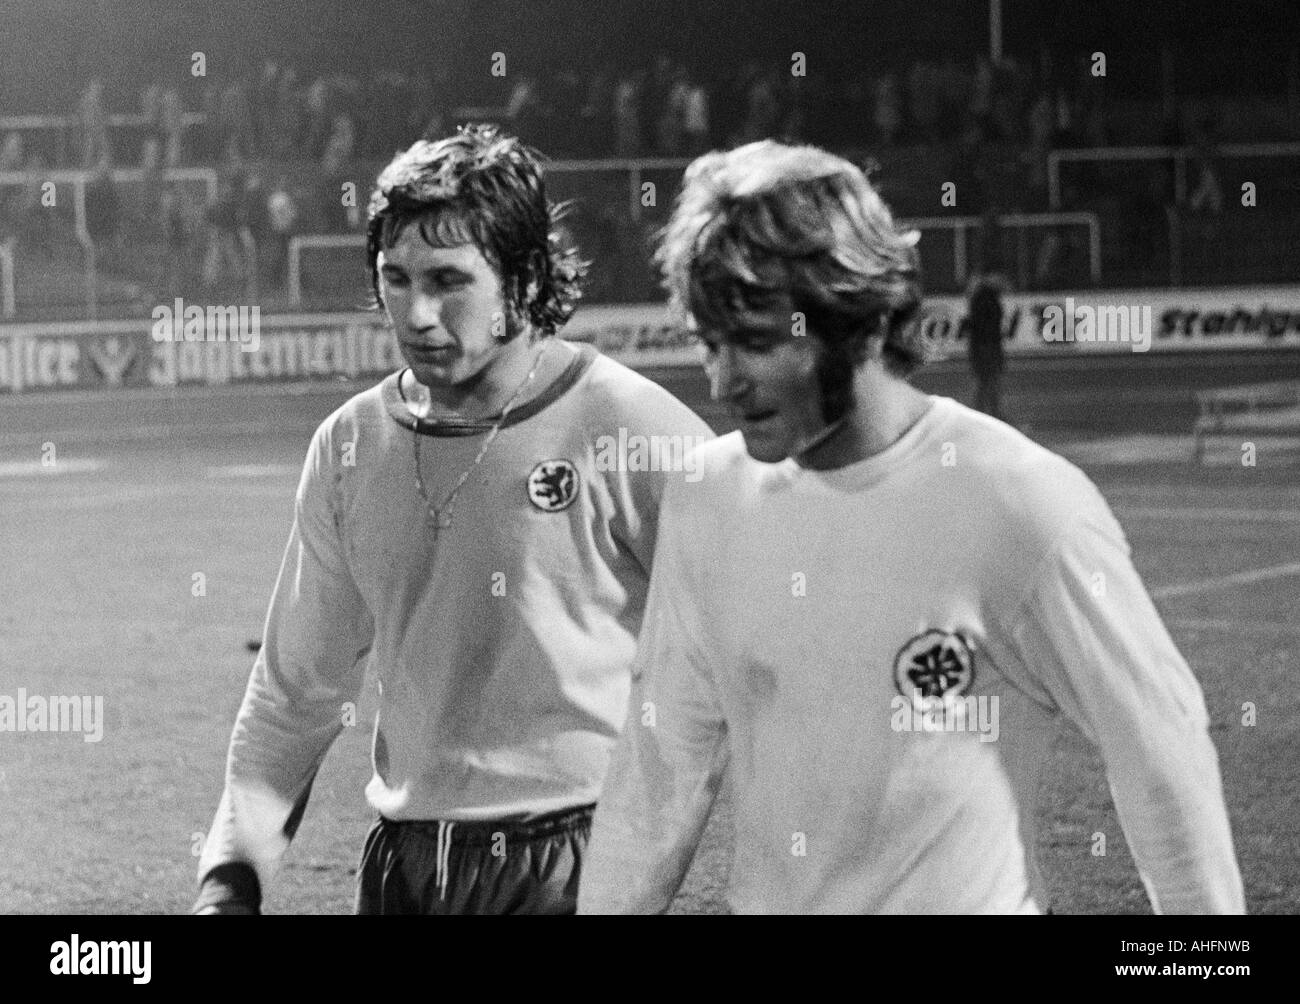 football, Bundesliga, 1972/1973, Rot-Weiss Oberhausen versus Eintracht Brunswick 0:1, Niederrhein Stadium in Oberhausen, football players leave the pitch, Franz Merkhoffer (BS) left and Willi Mumme (RWO) - Stock Image